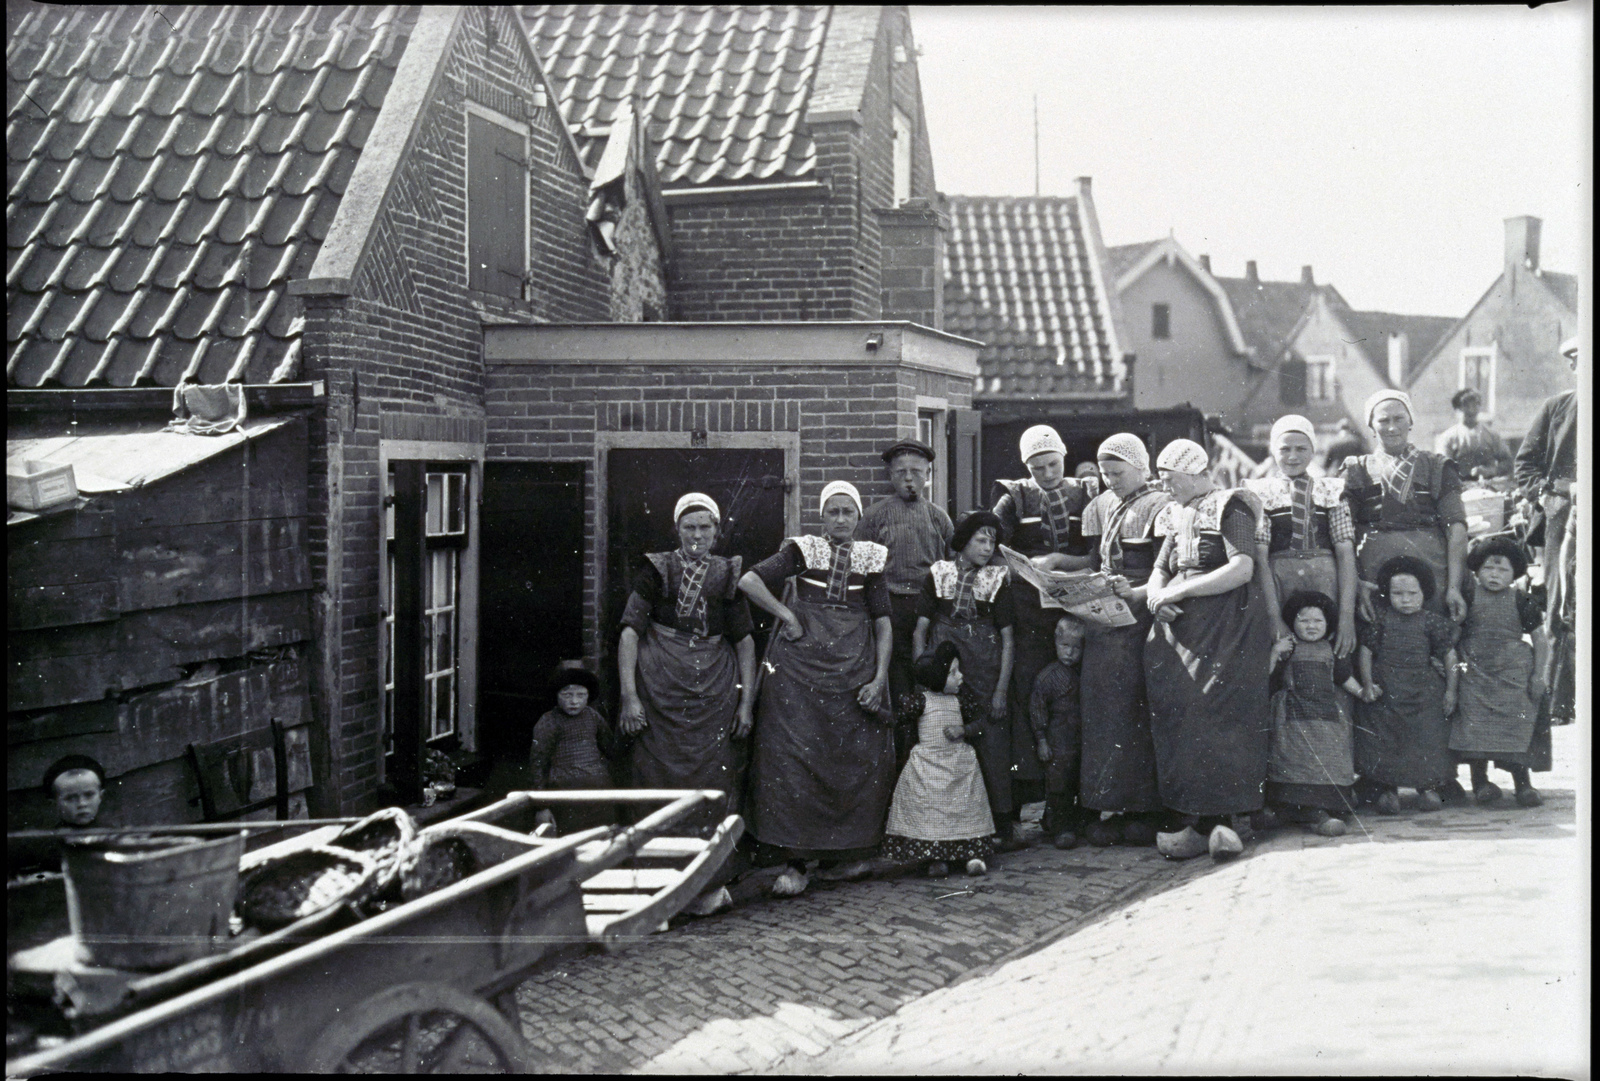 Straatbeeld van dorpsbewoners met kar.